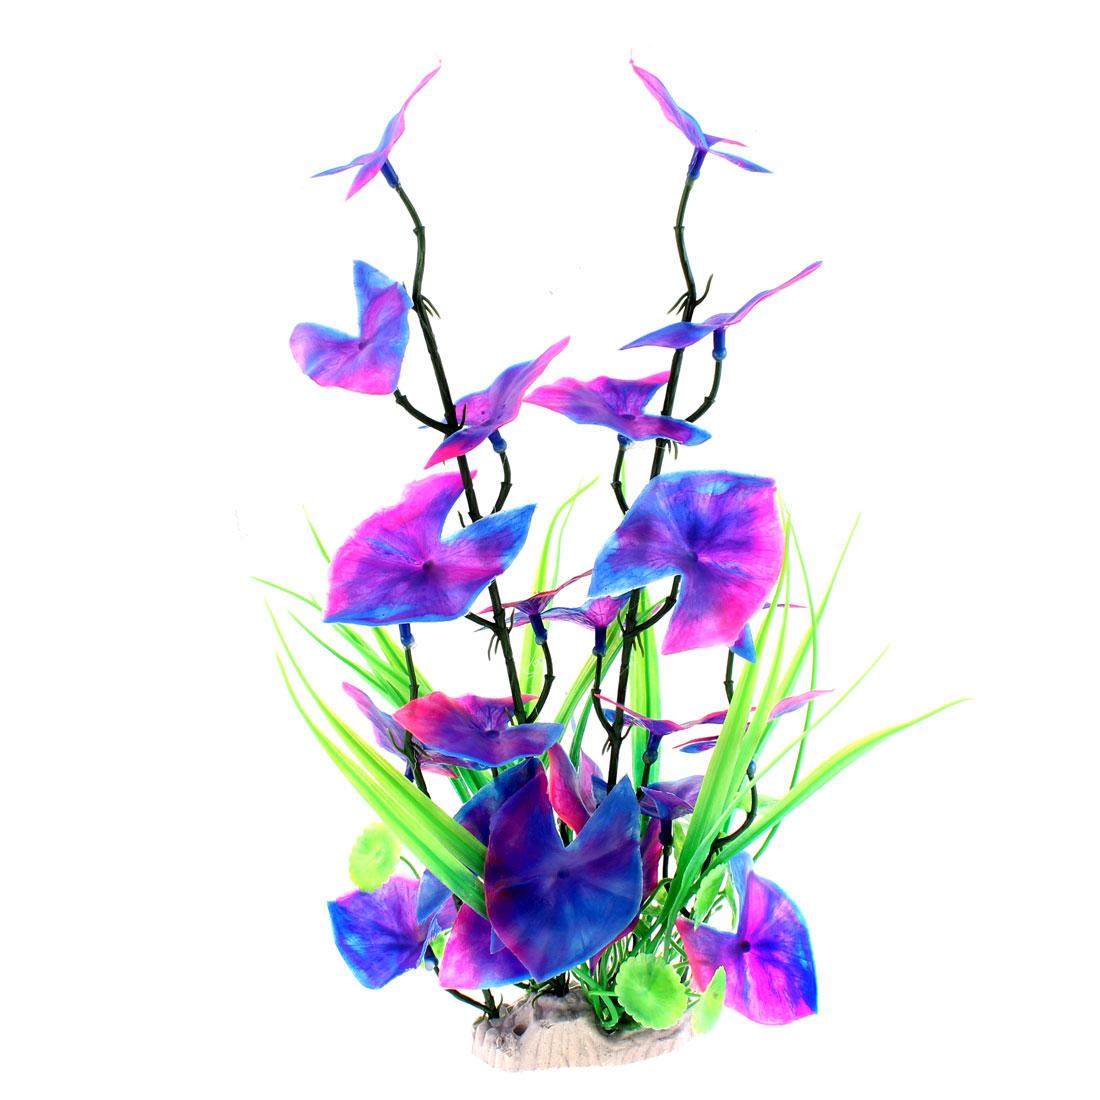 "Aquarium Plastic Landscaping Water Grass Plant Decoration 14"" Height"